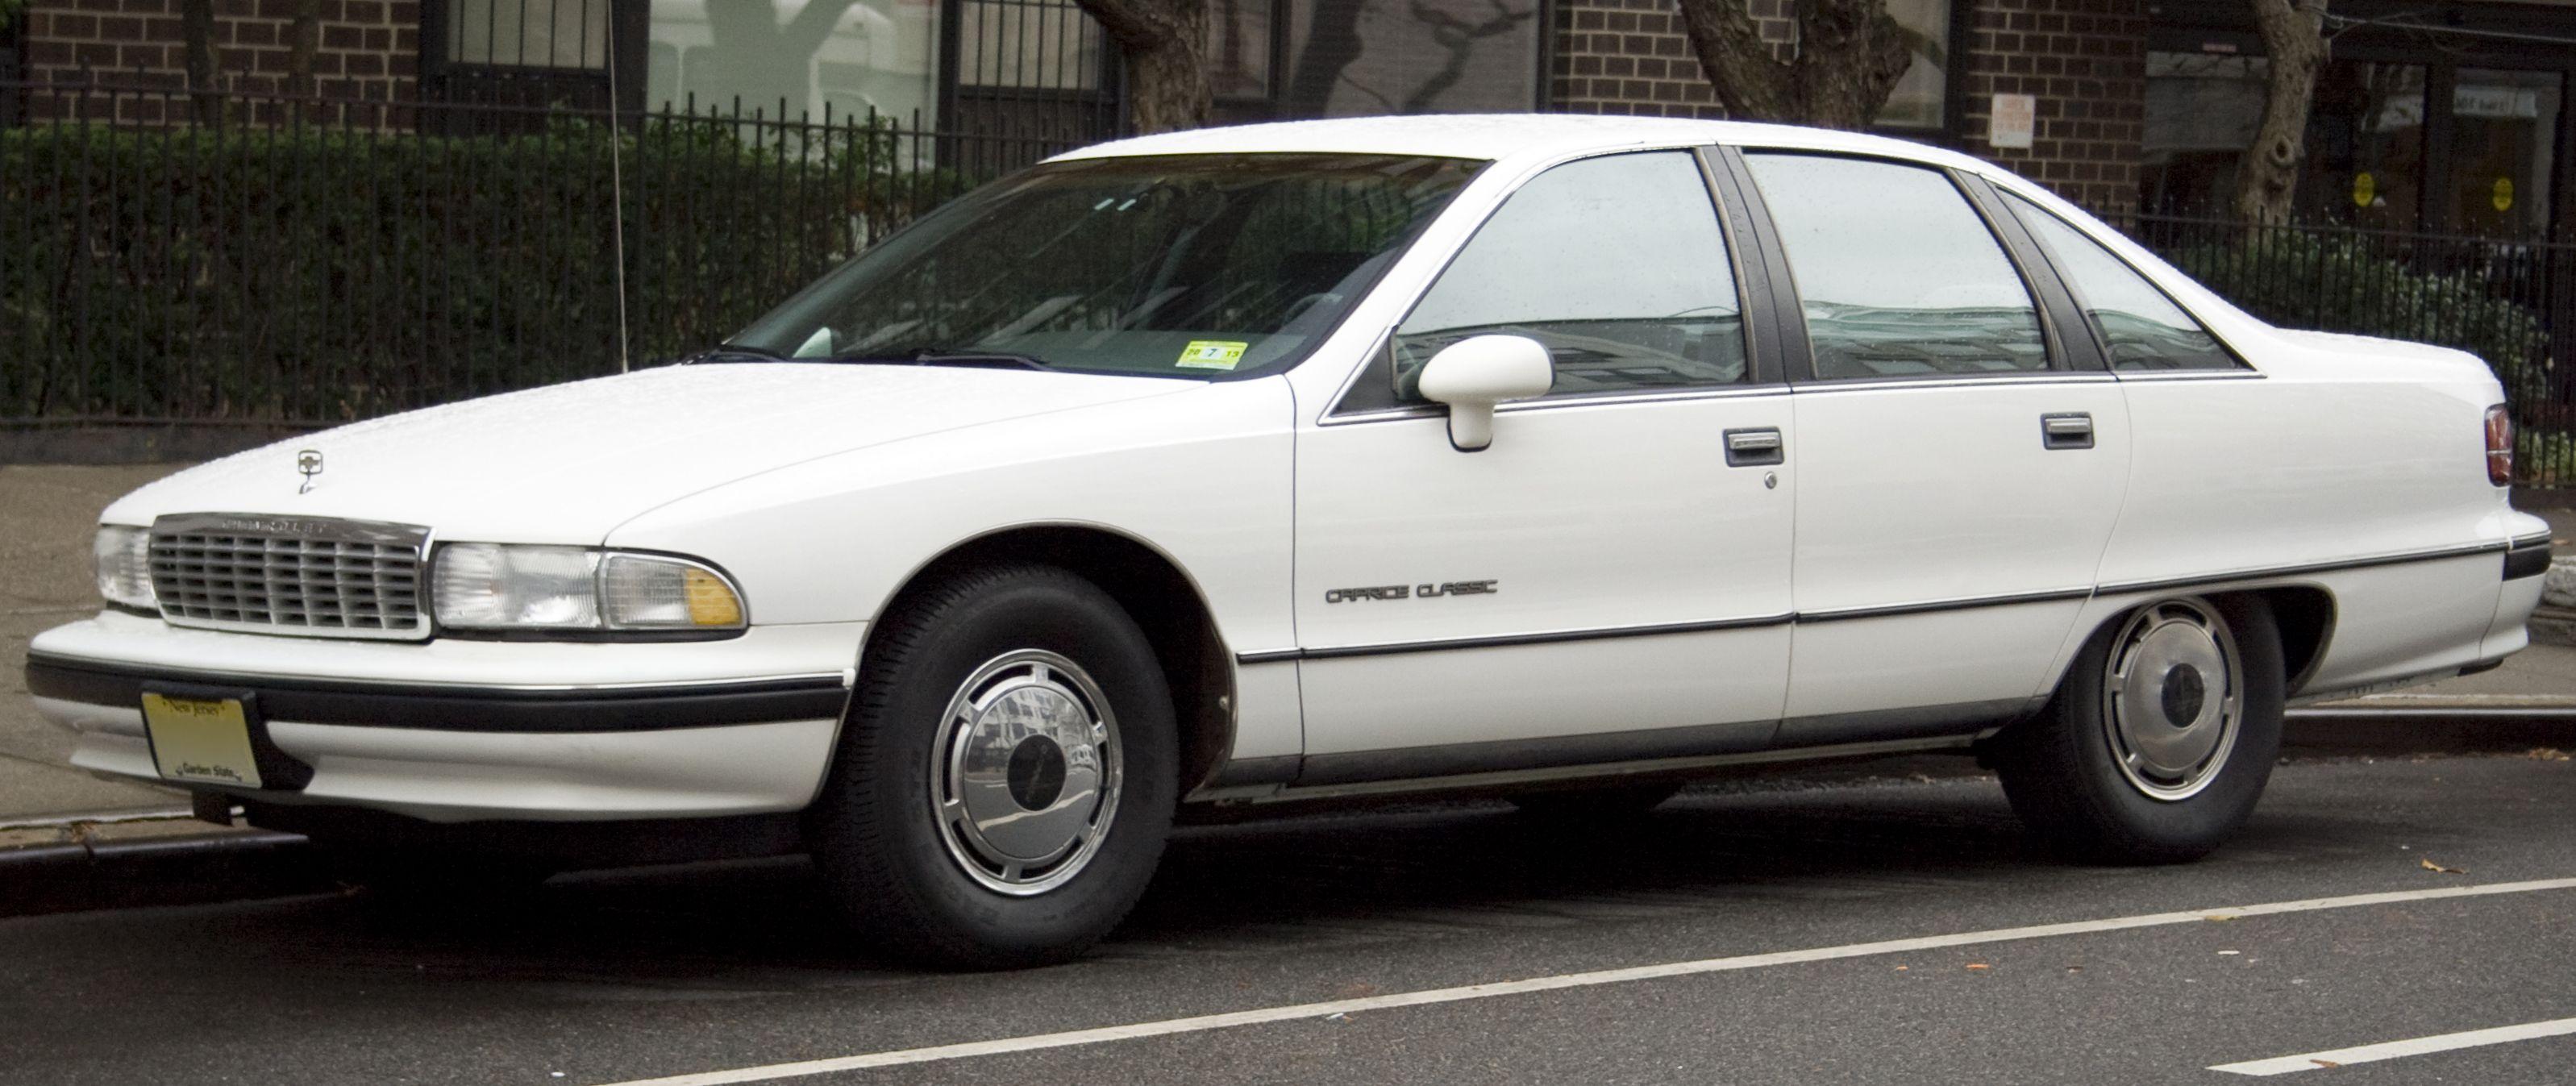 1991 Chevrolet Caprice Classic mrimpalasautoparts com | 1991